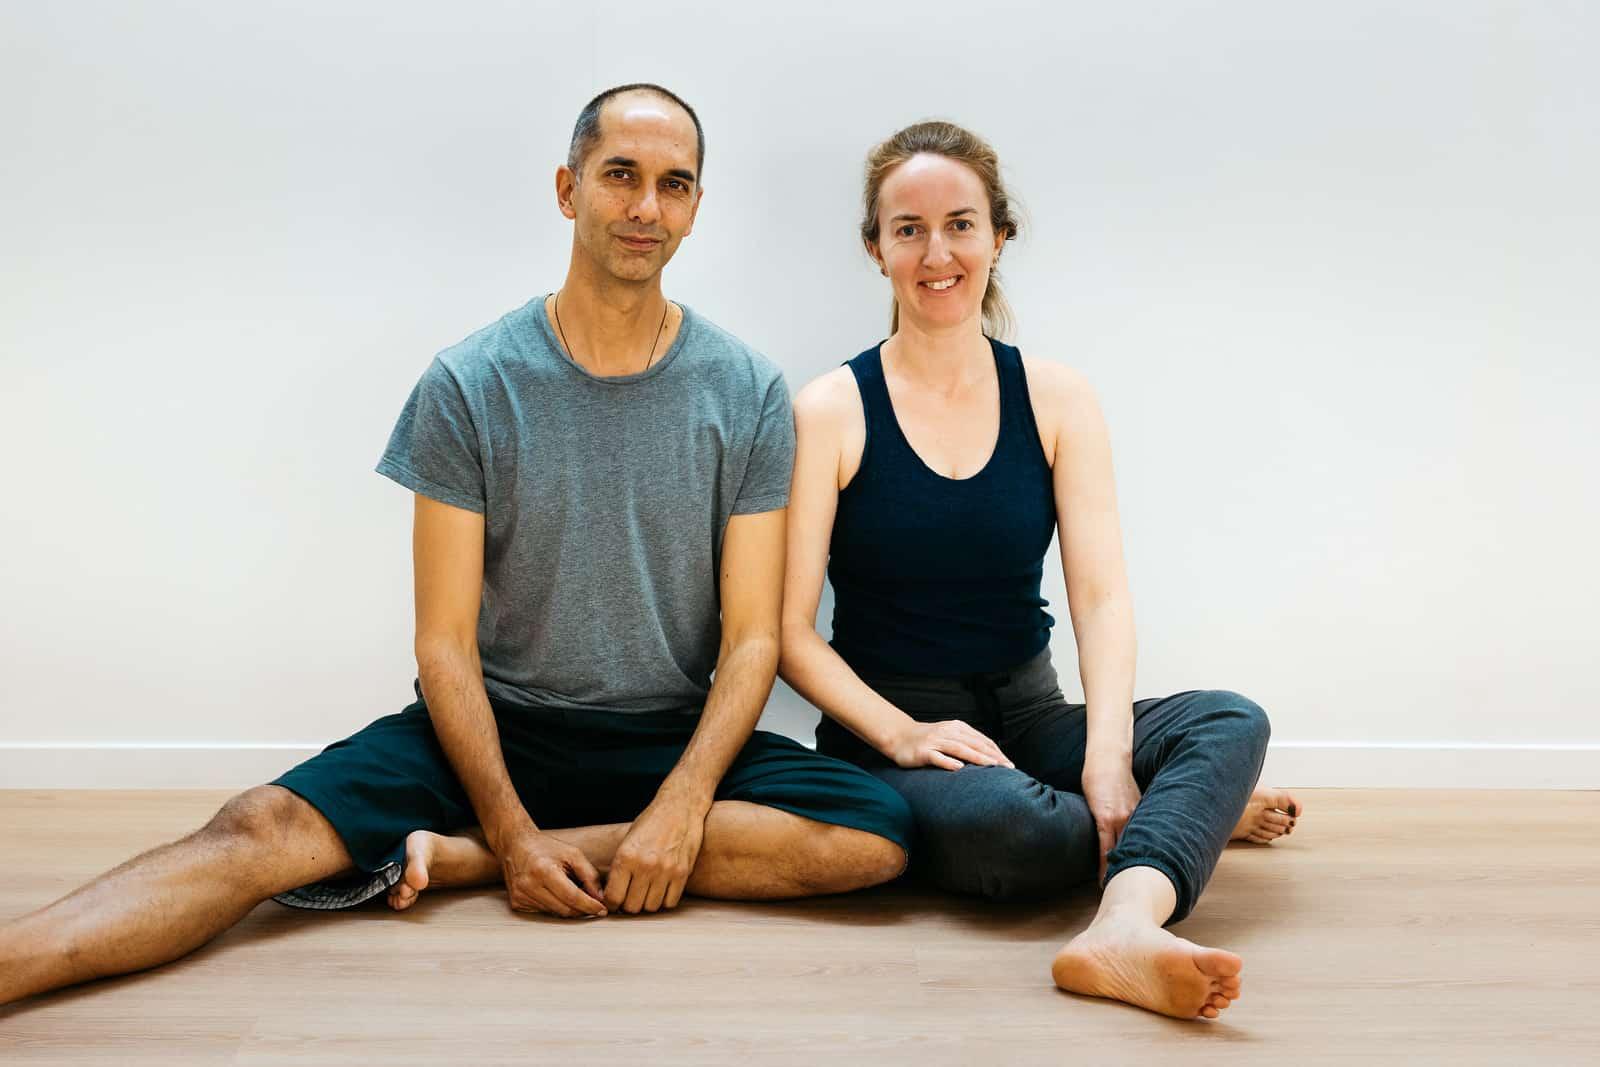 Neal Ghoshal and Karla Brodie, Contemporary Yoga, Restorative Yoga Training